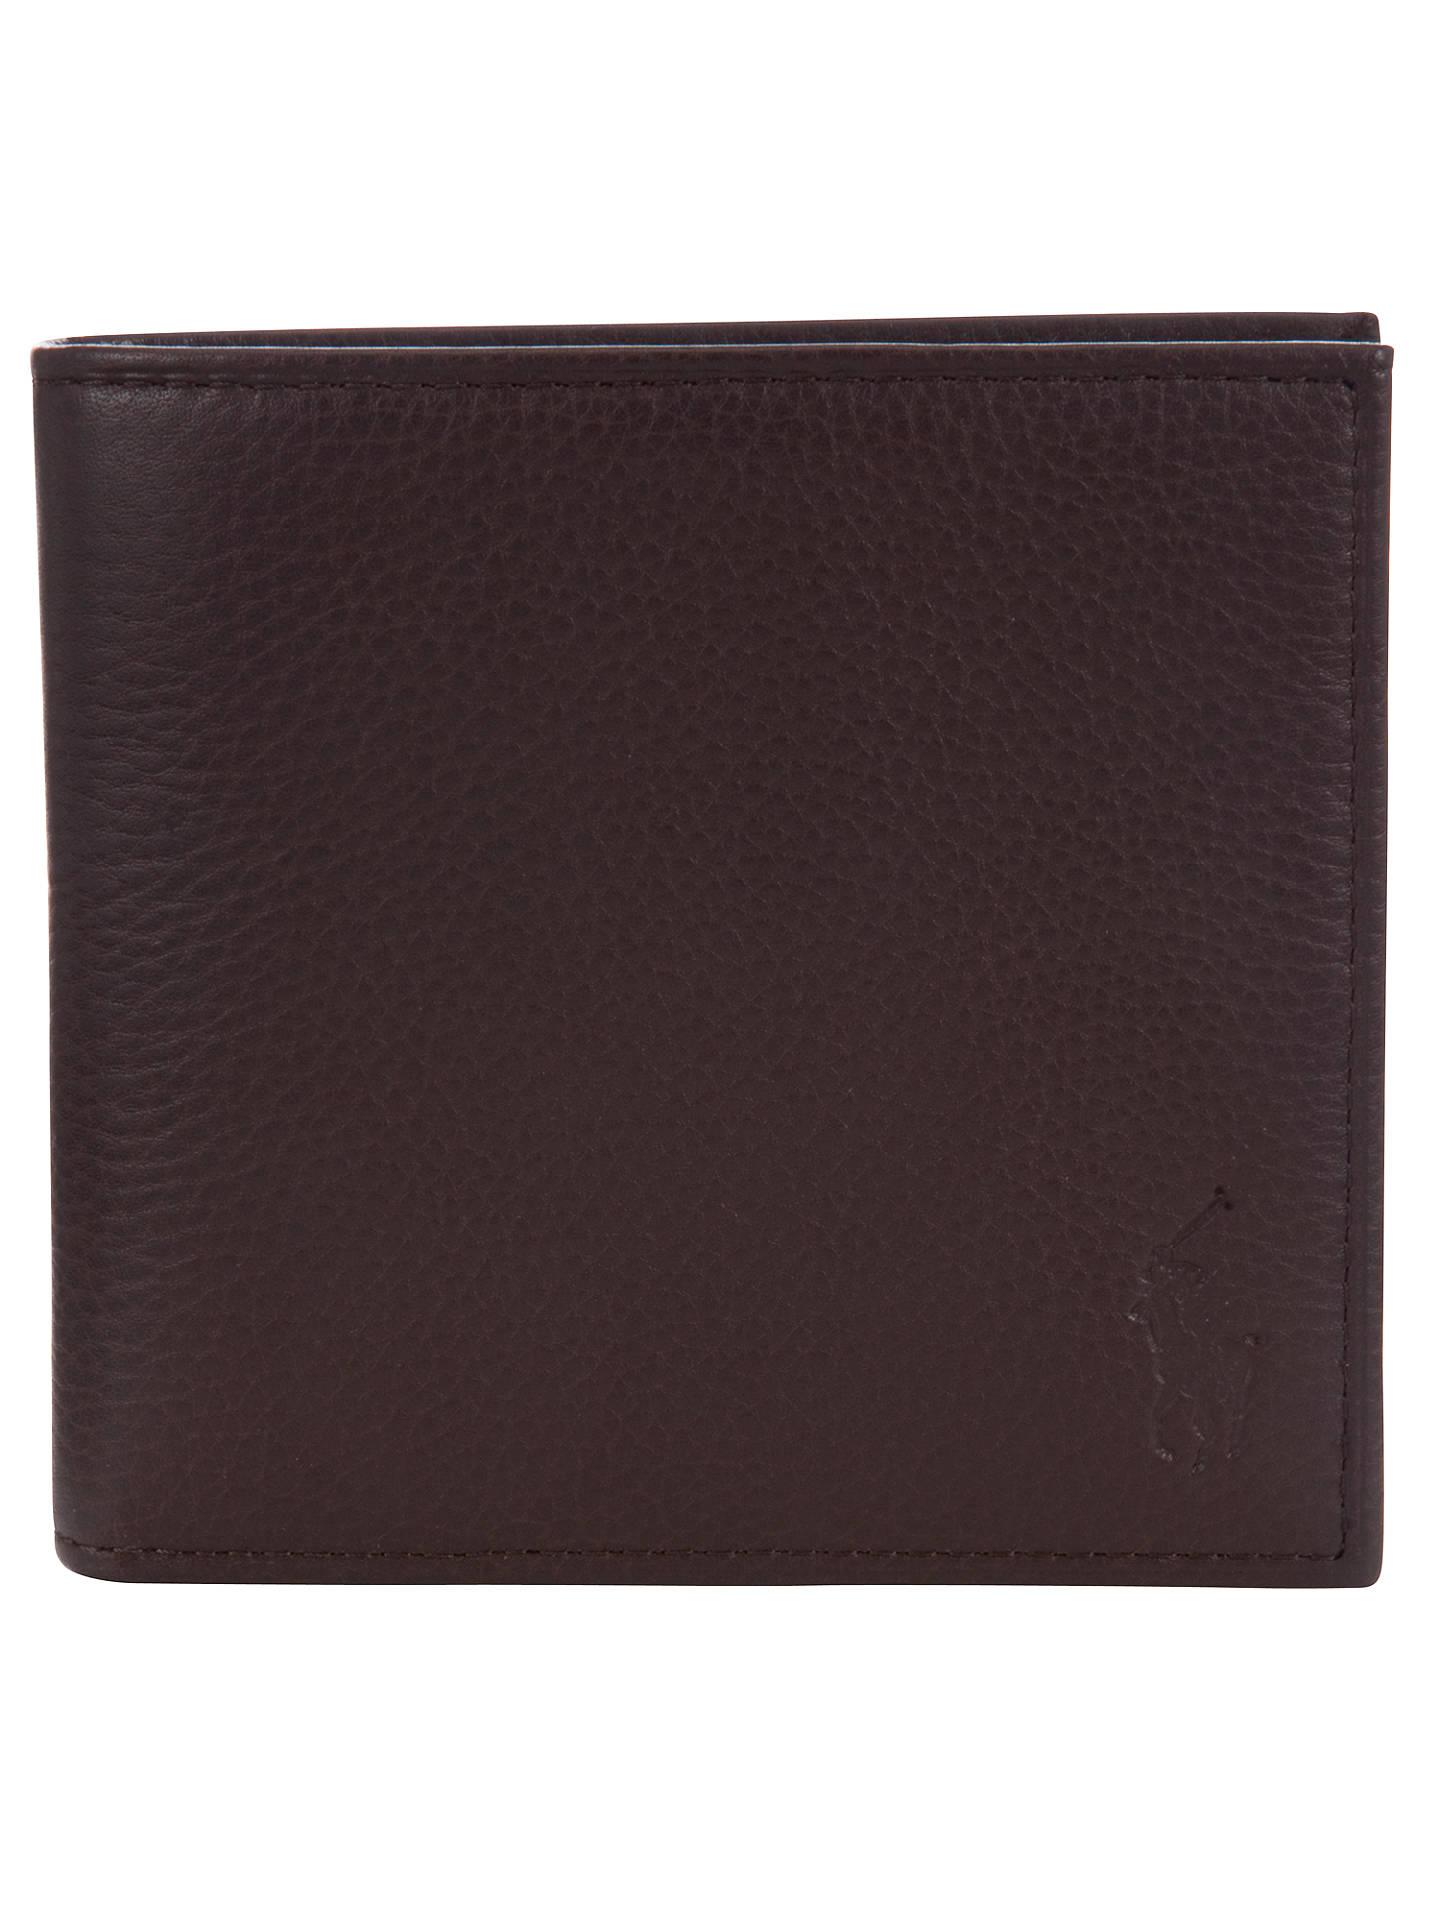 f92b3de0f6ab Buy Polo Ralph Lauren Pebble Leather Wallet, Brown Online at johnlewis.com  ...